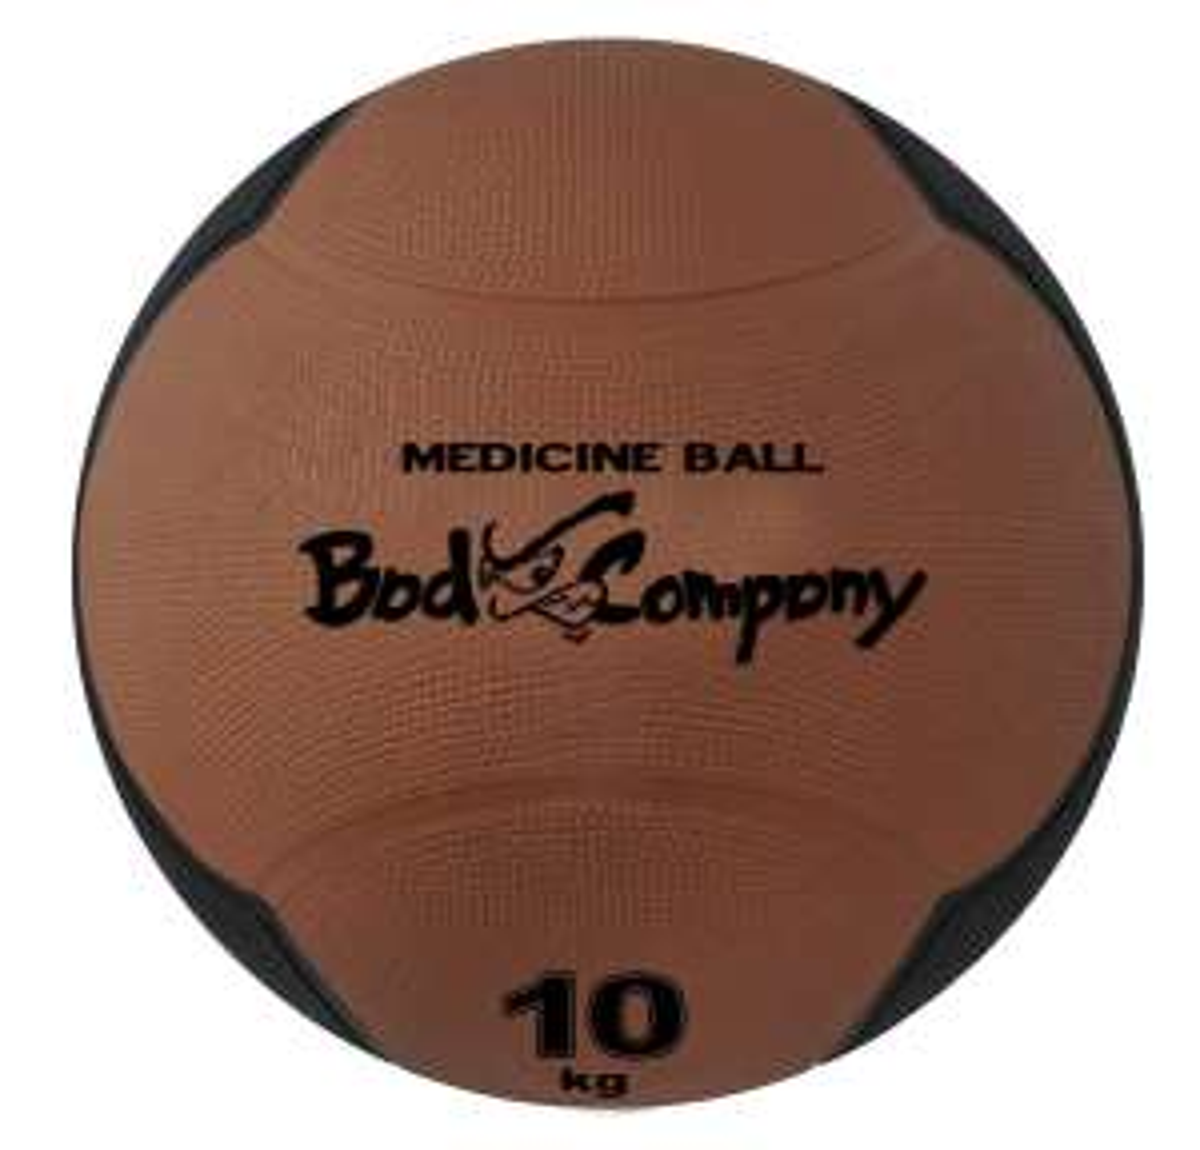 Medizinball / Gymnastikball 10 Kg